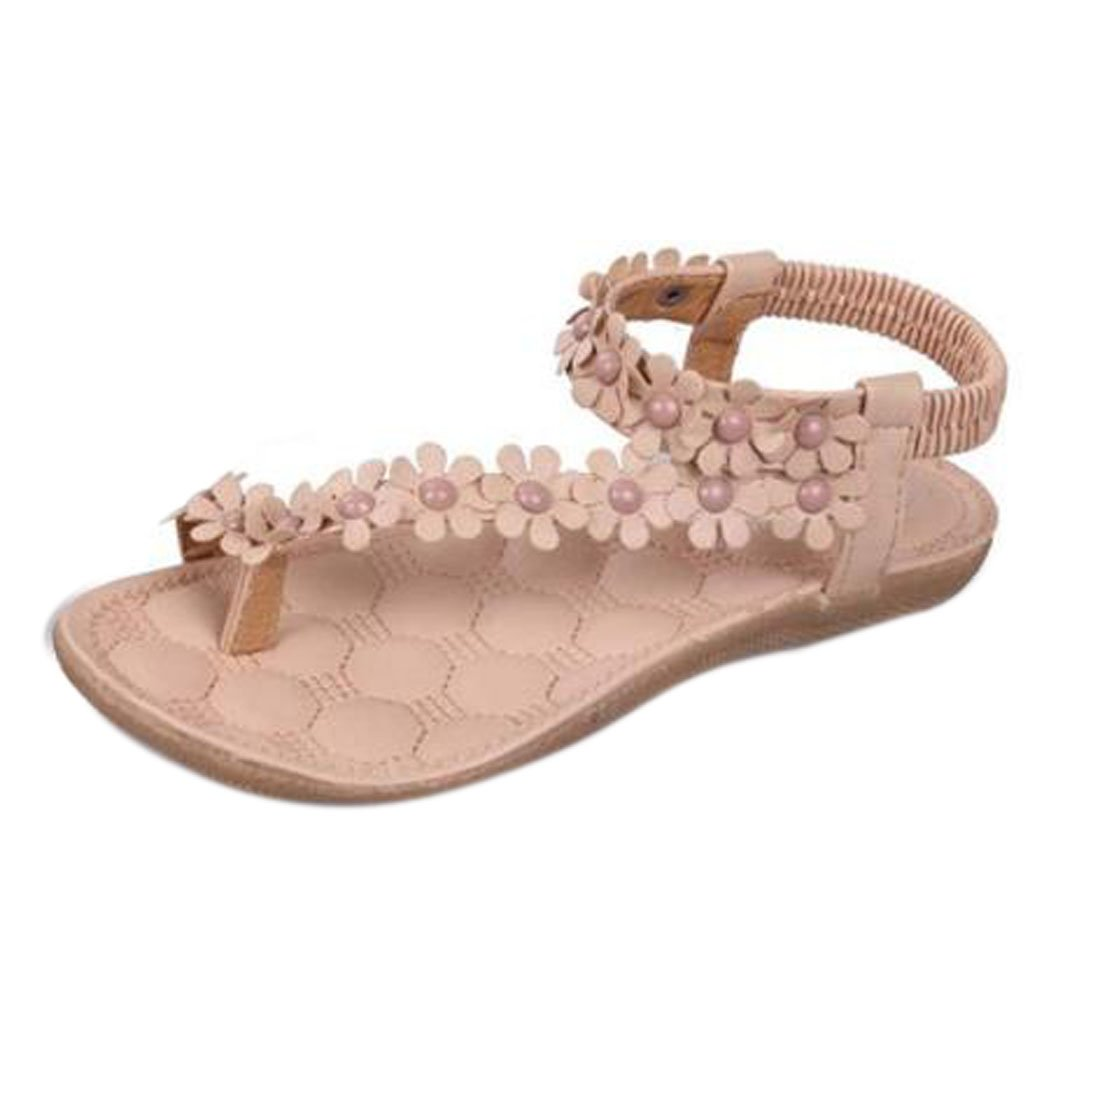 Damen Sommer Schuhe Xinan Bouml;hmen Blumen Flip Flop Sandalen  39|??khaki ??